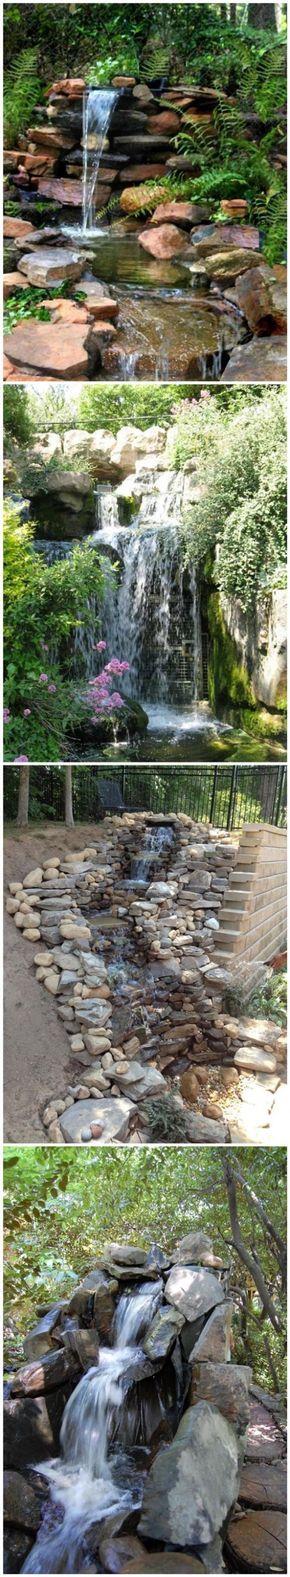 How To Build A Garden Waterfall Pond | DIY Tag | Garden ...